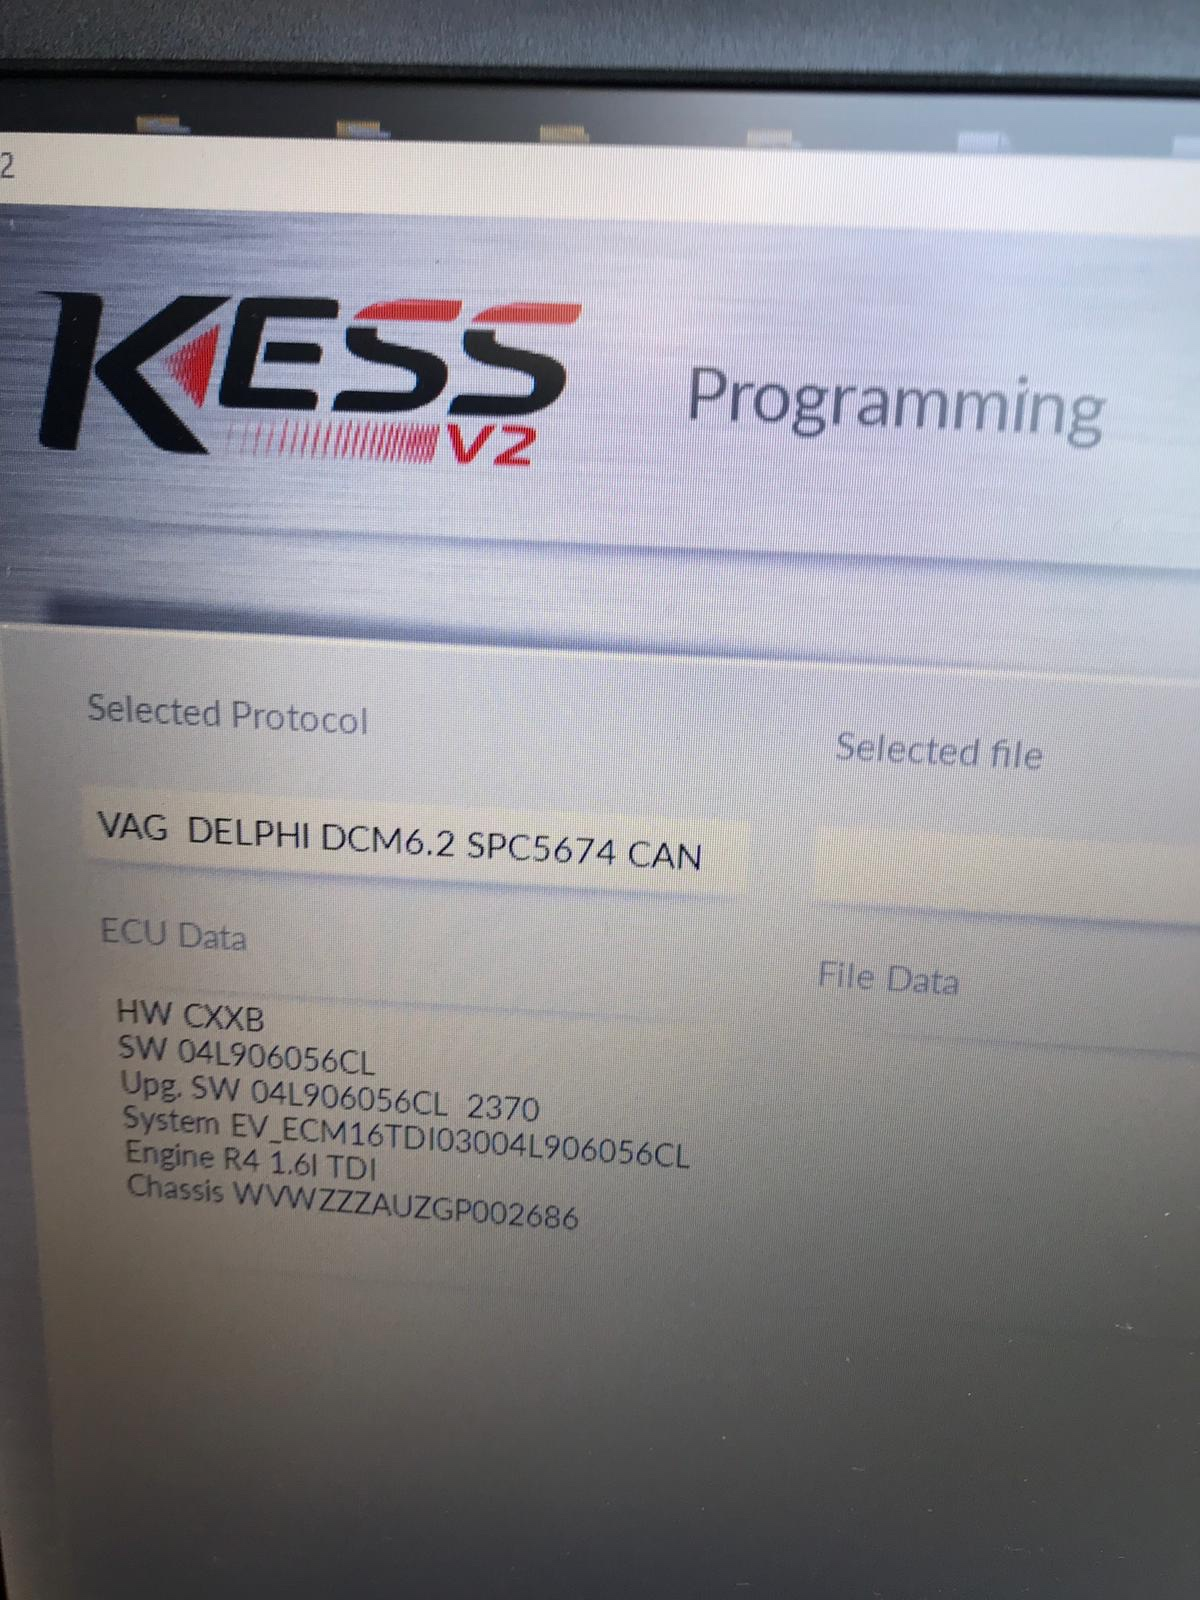 Vag Delphi Dcm6 2